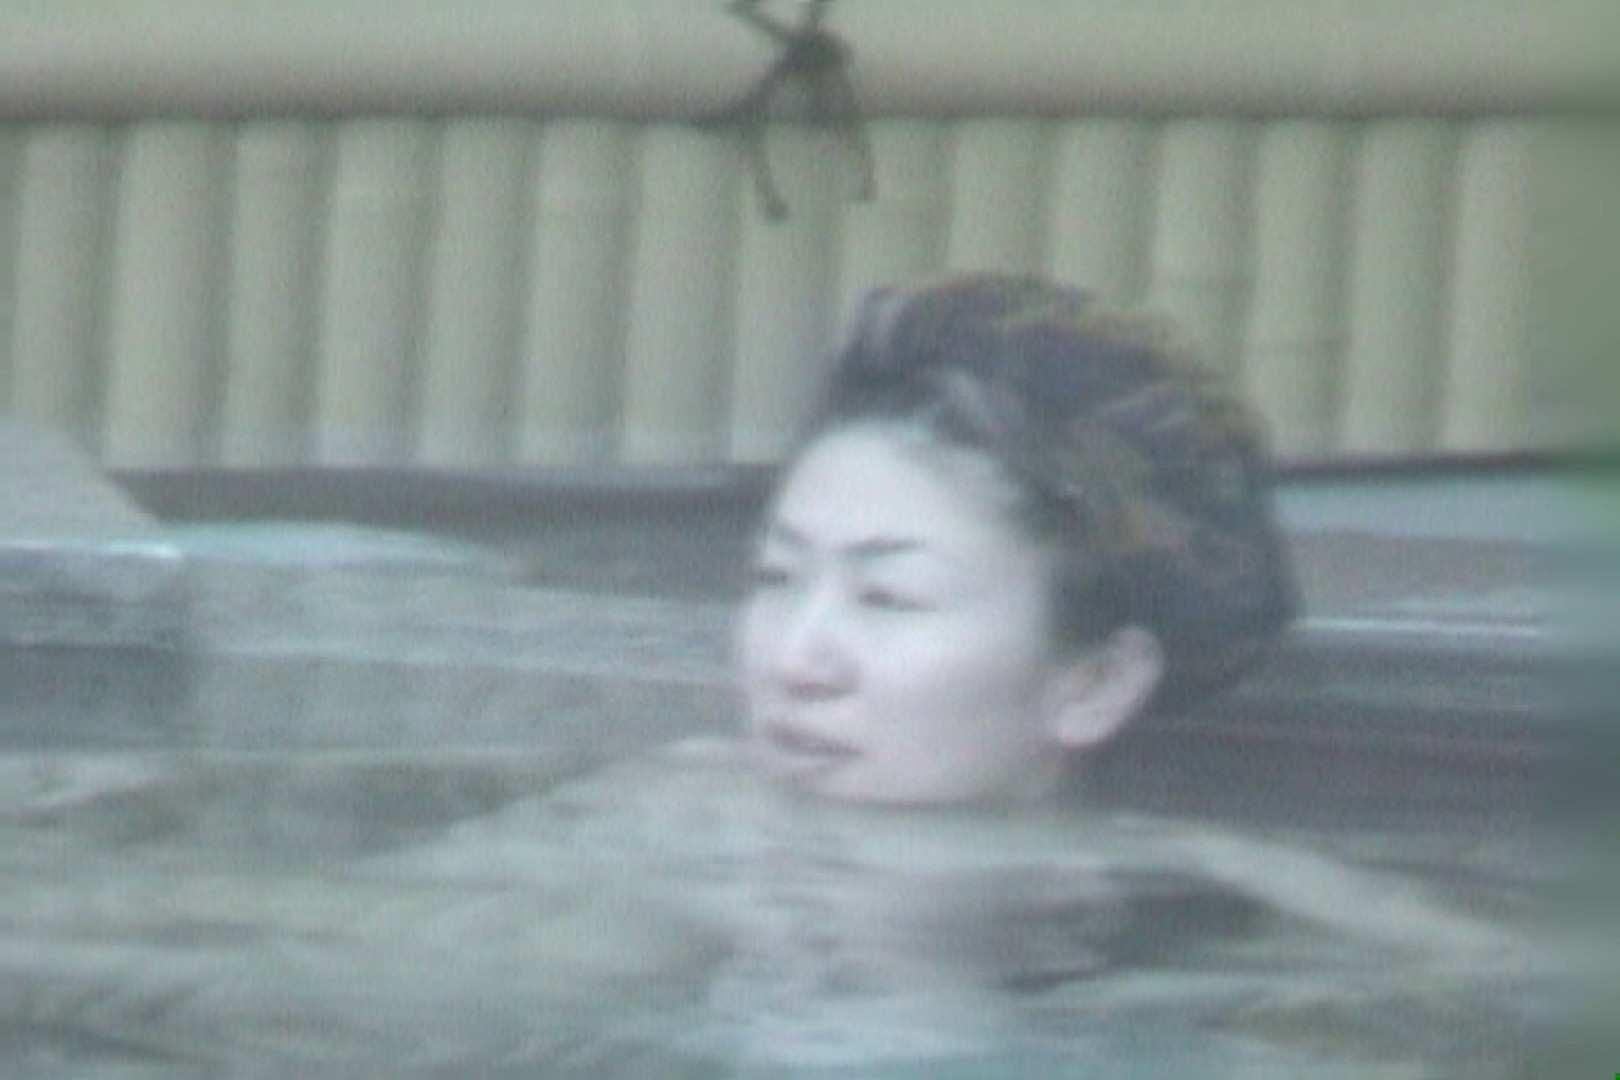 Aquaな露天風呂Vol.607 盗撮シリーズ | 露天風呂編  107PIX 27